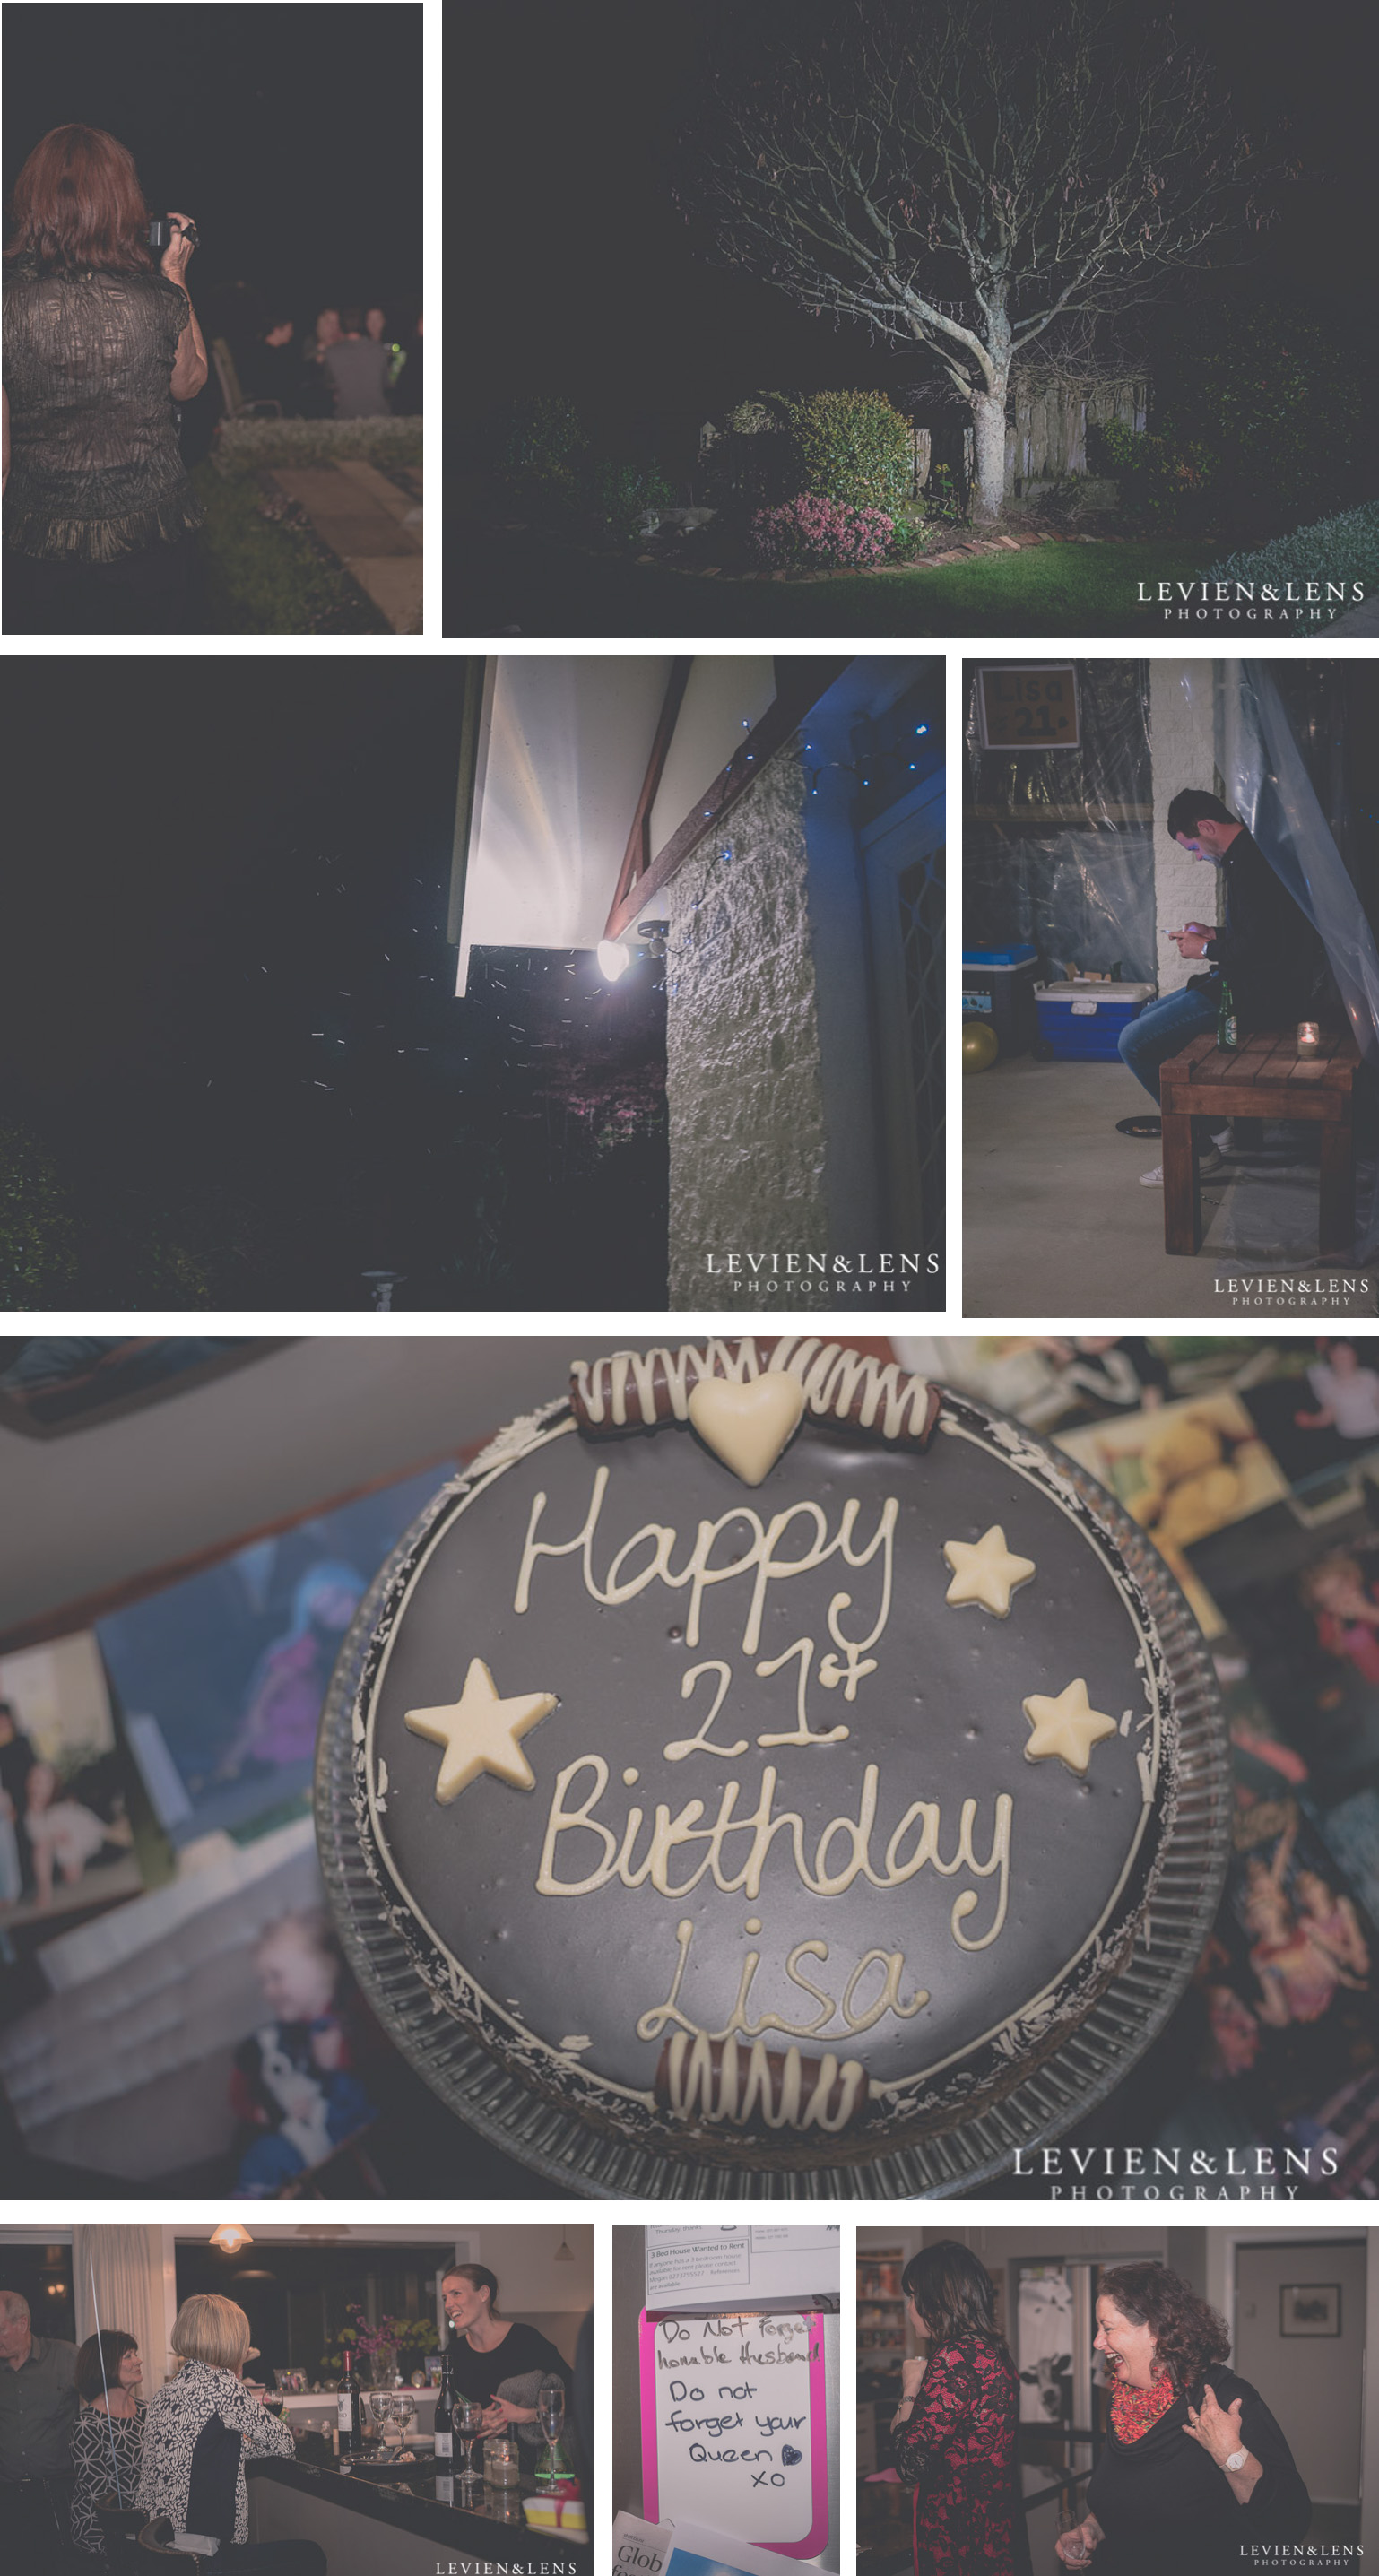 Birthday cake photographs